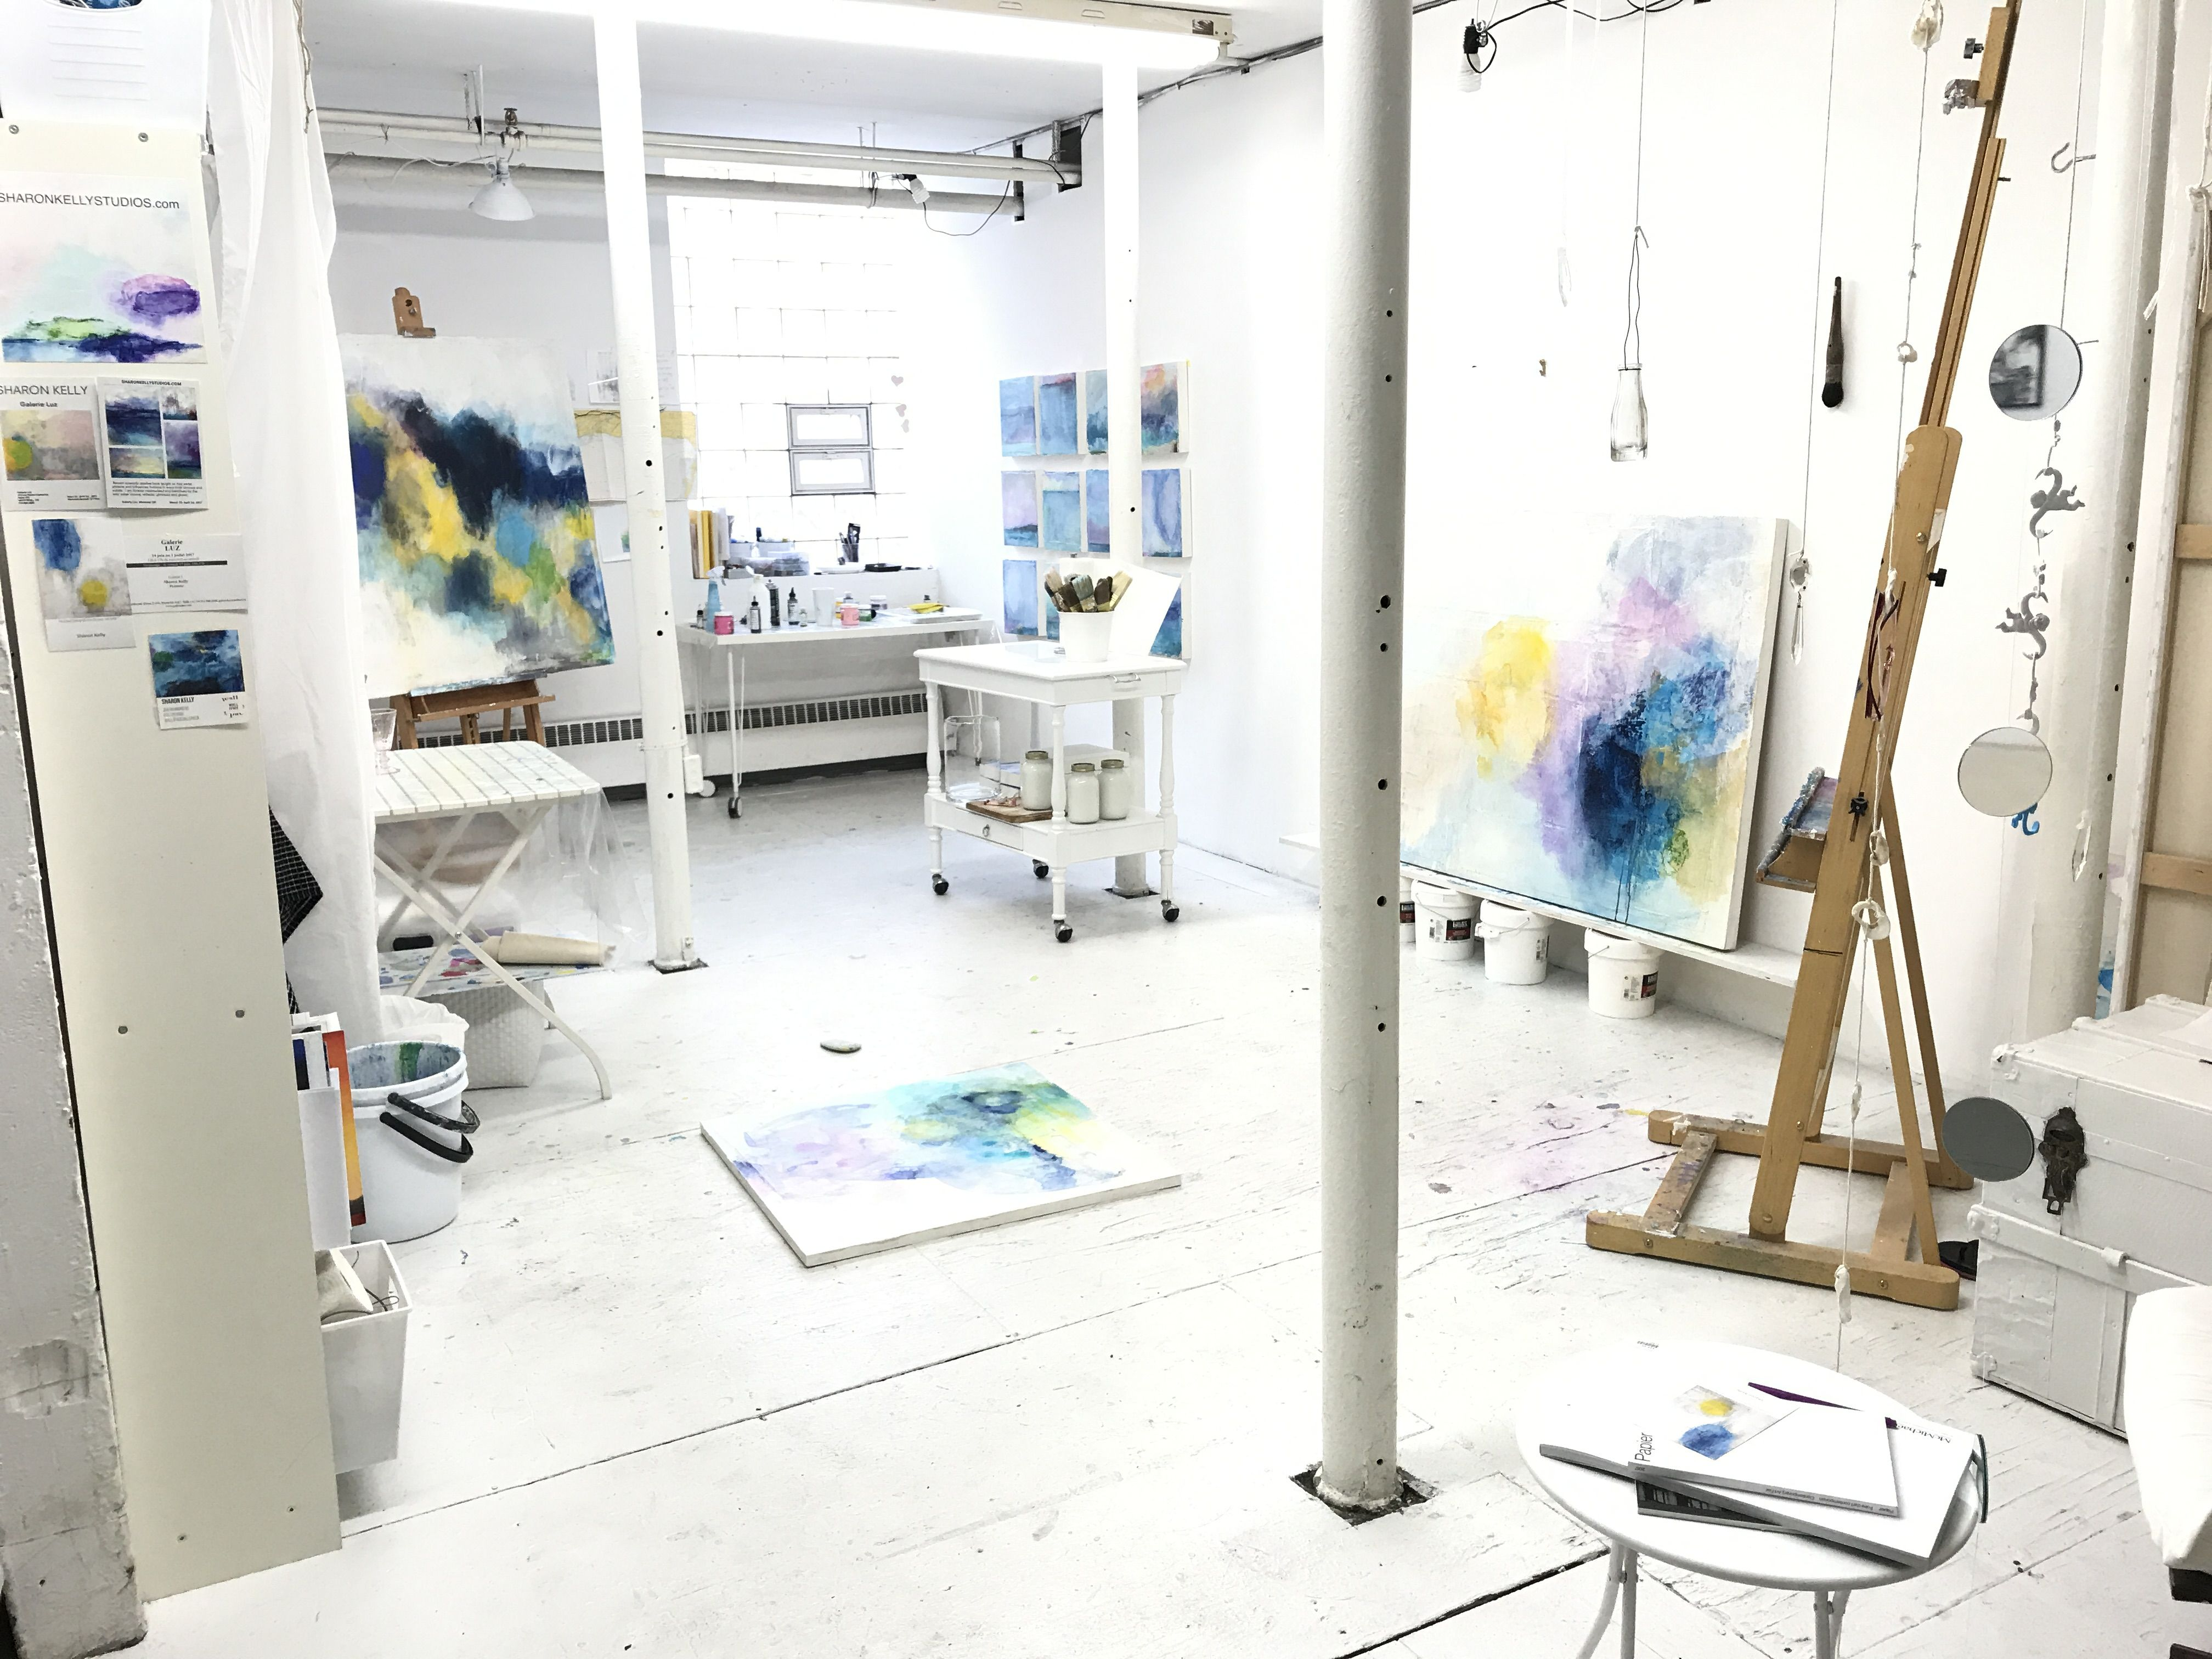 images?q=tbn:ANd9GcQh_l3eQ5xwiPy07kGEXjmjgmBKBRB7H2mRxCGhv1tFWg5c_mWT Trends For Art Studios Ottawa @koolmobiles.com